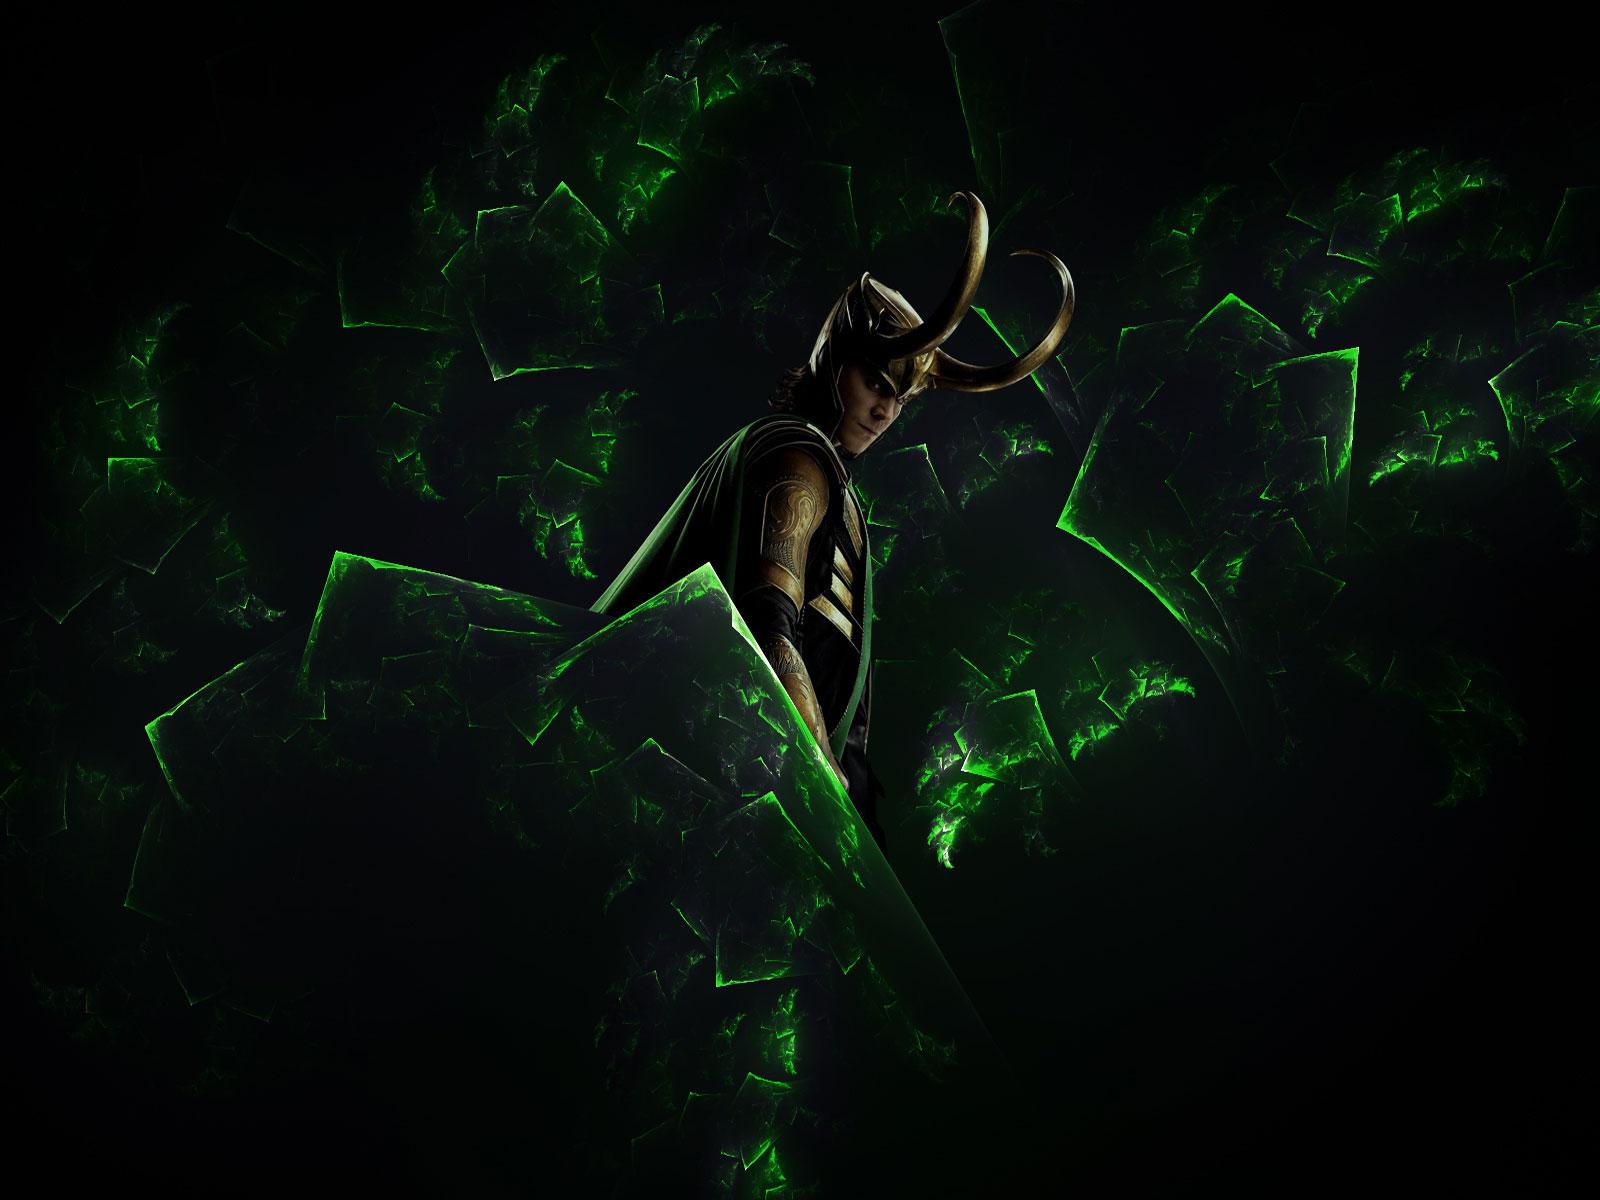 Loki wallpapers Loki background 1600x1200